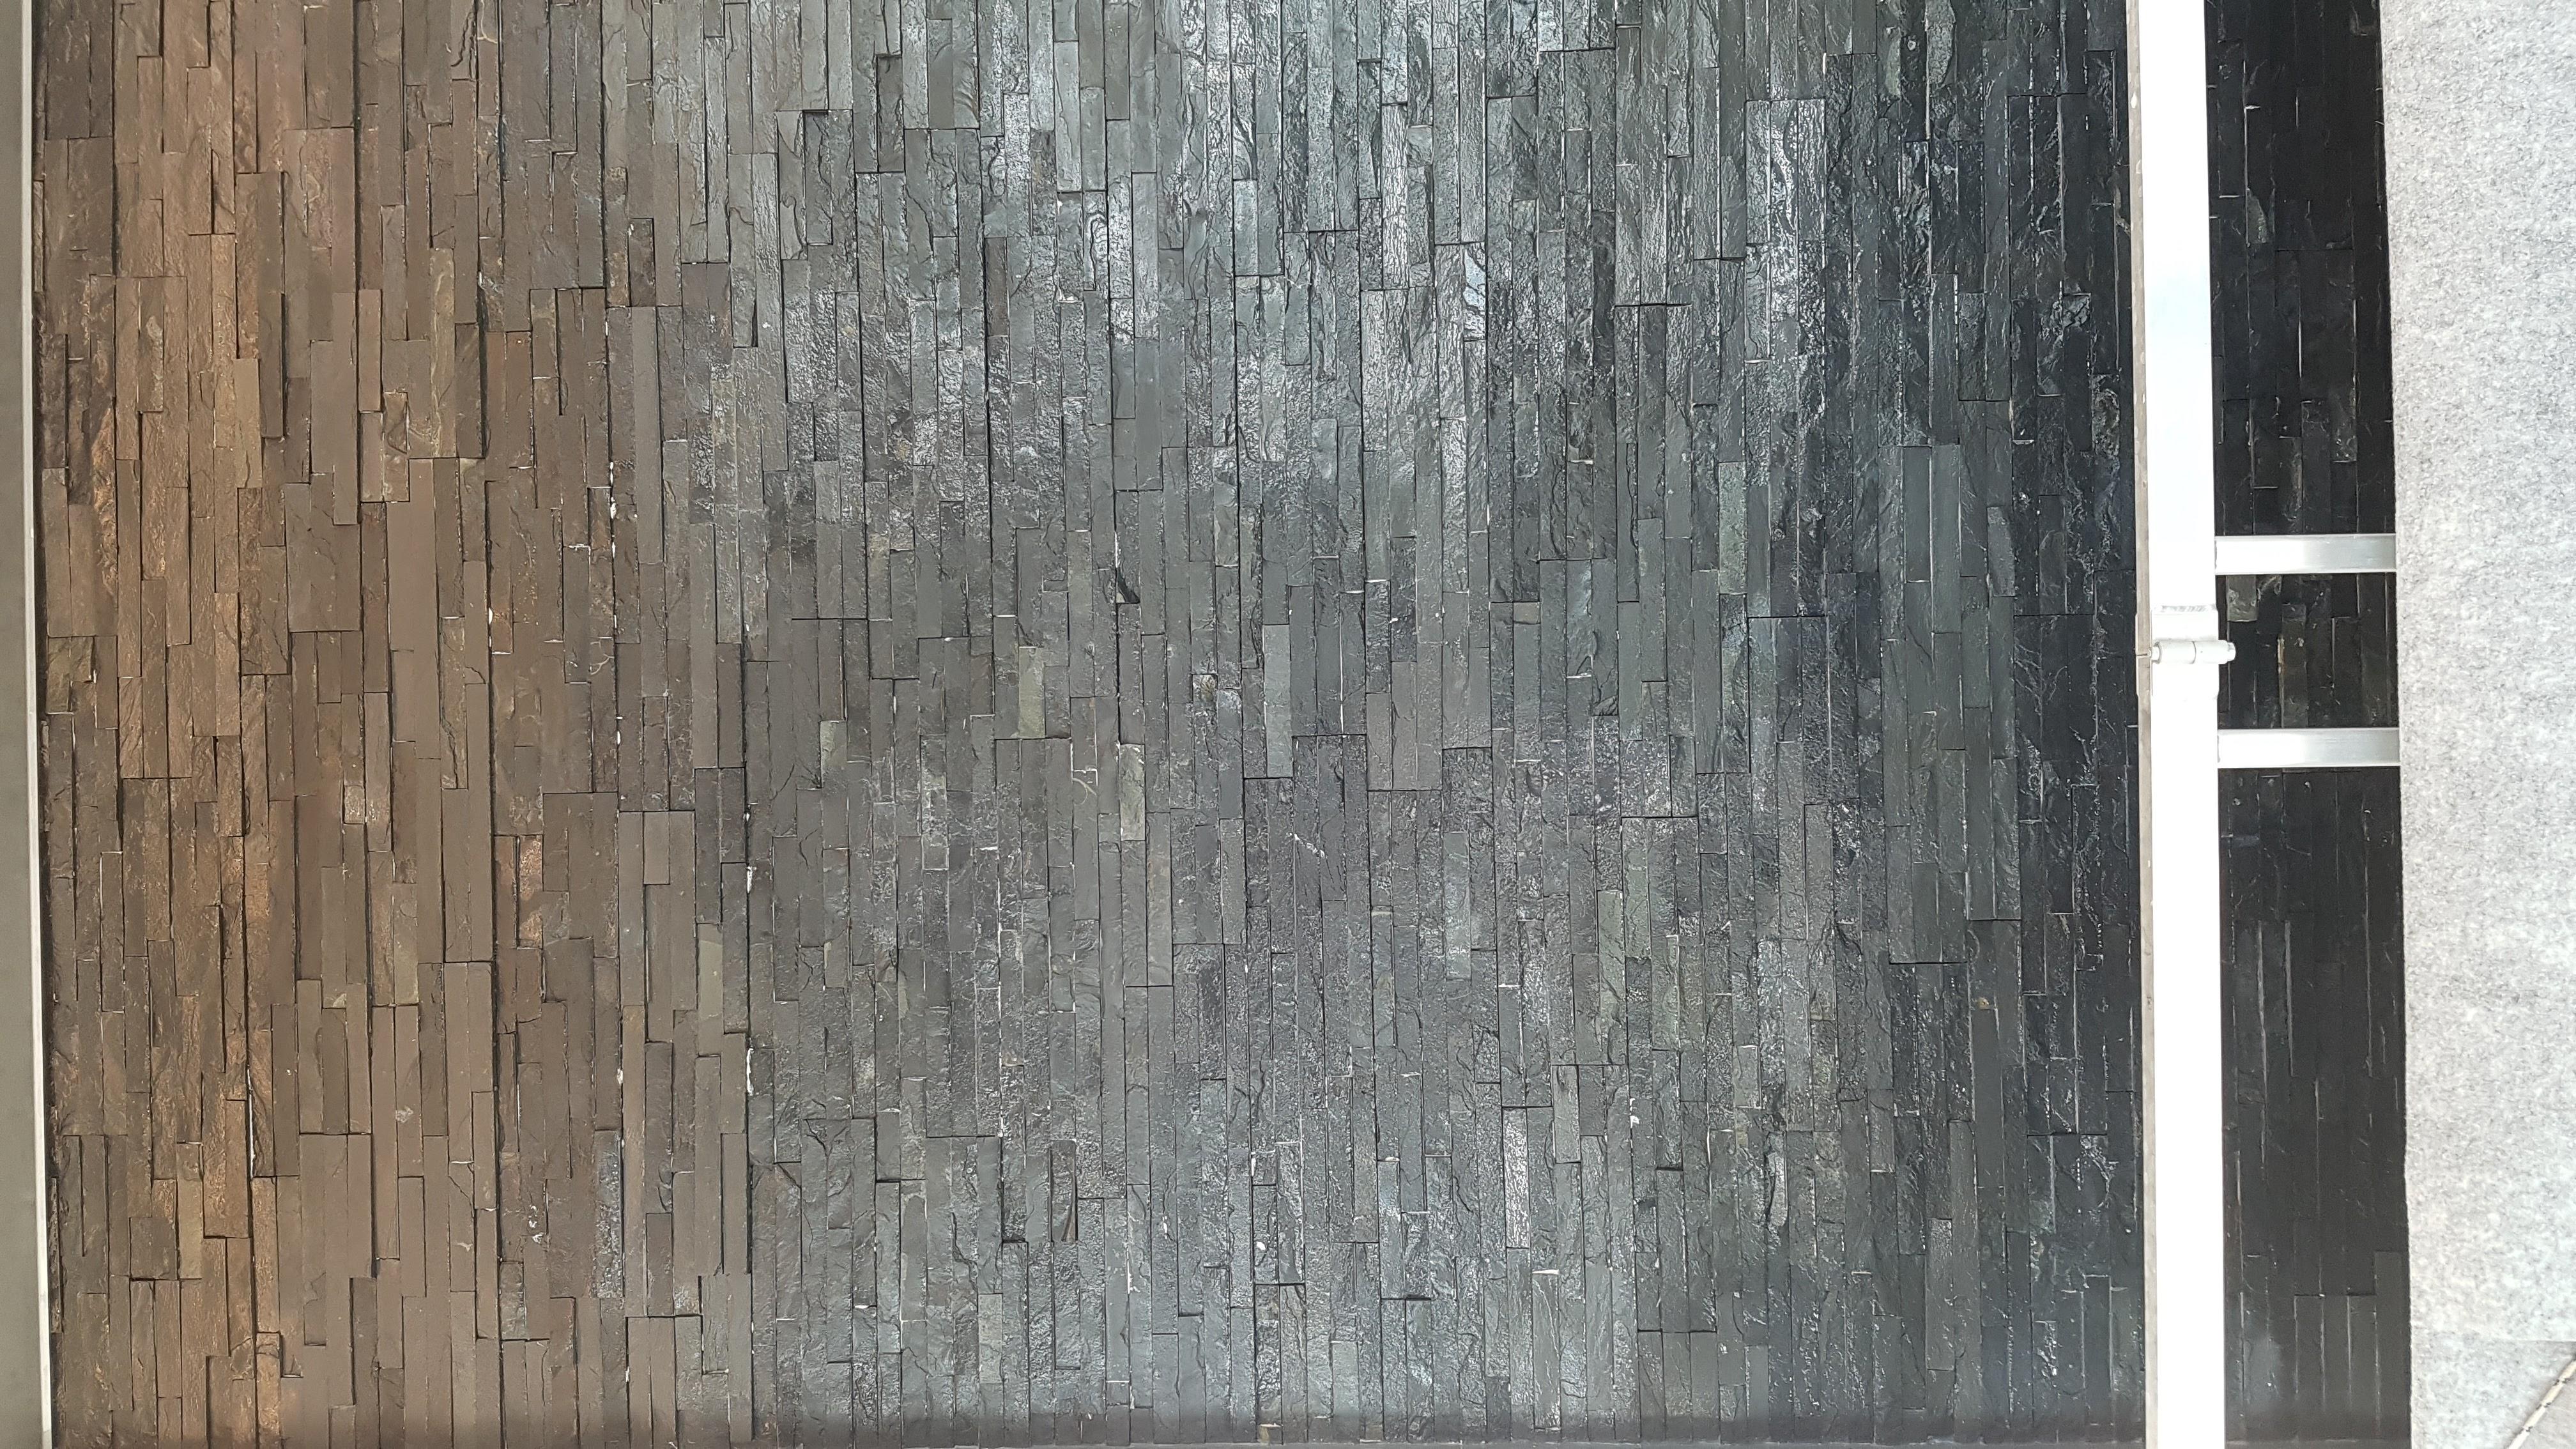 20171102_133709